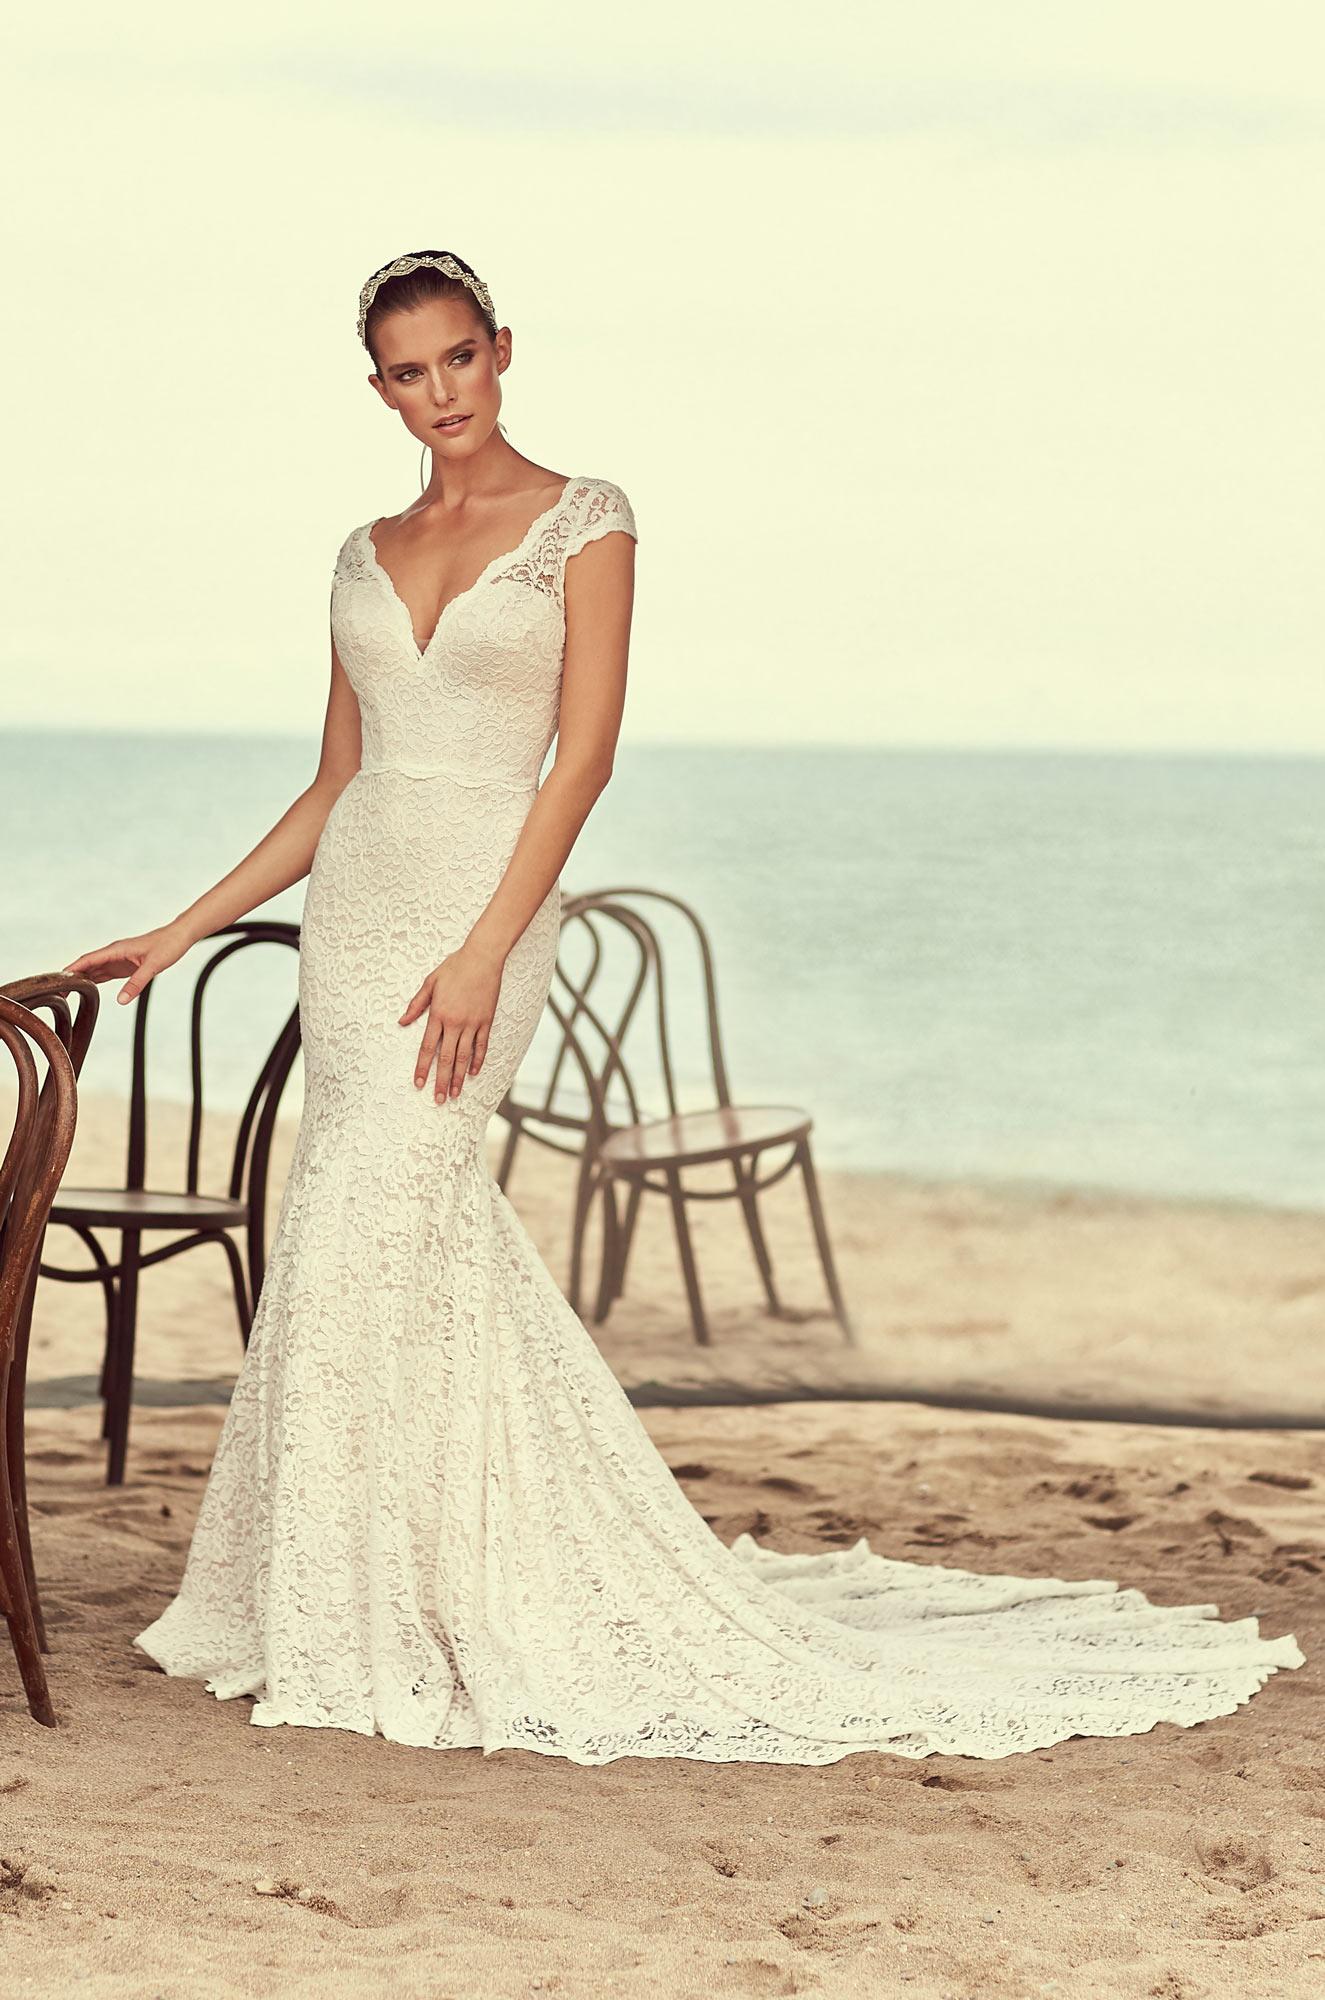 Scalloped Neckline Wedding Dress – Style #2189 | Mikaella Bridal